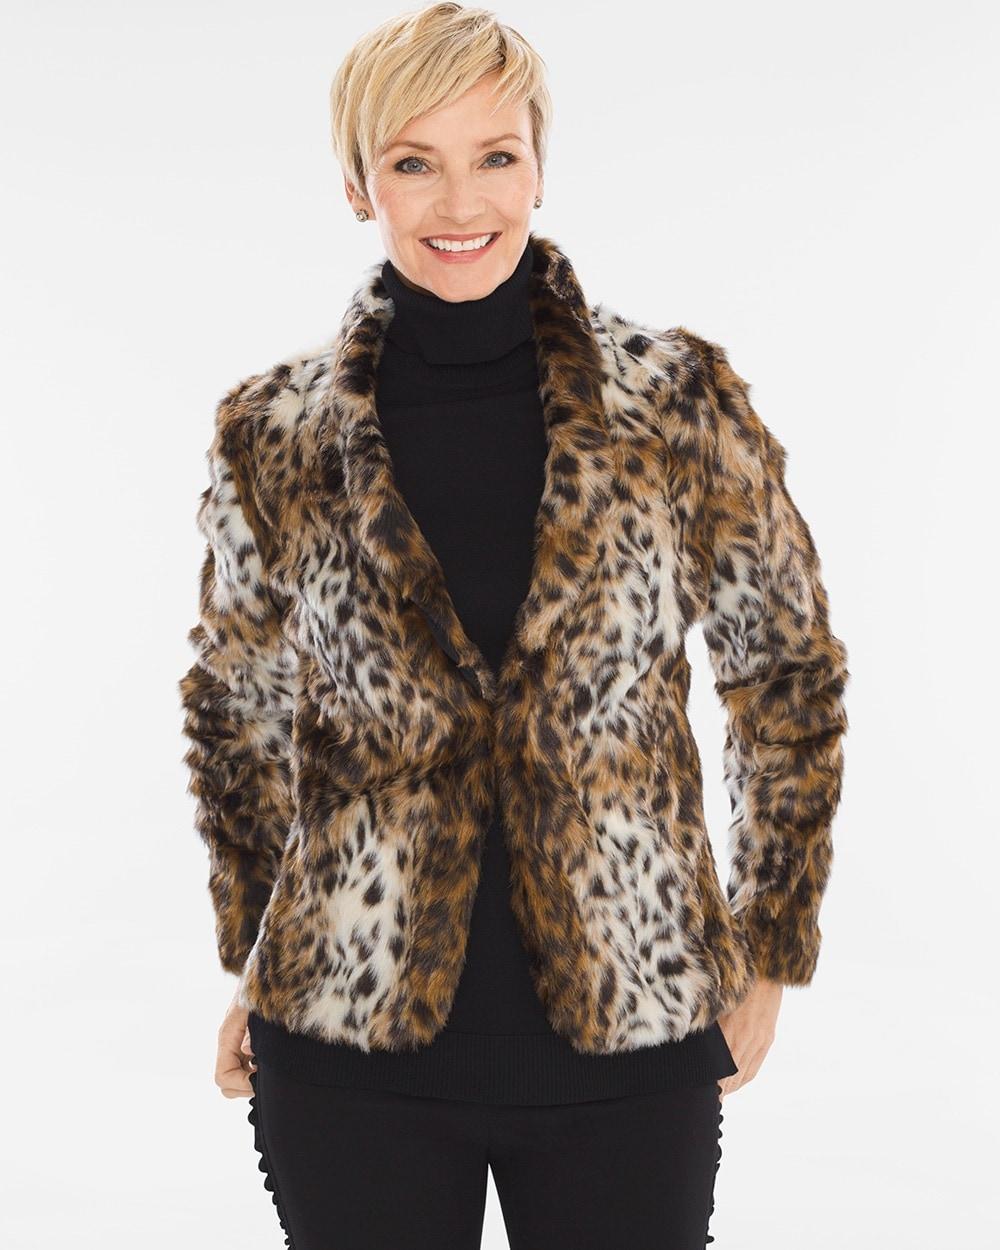 7edc4809caa7 Animal Faux-Fur Jacket - Chico's